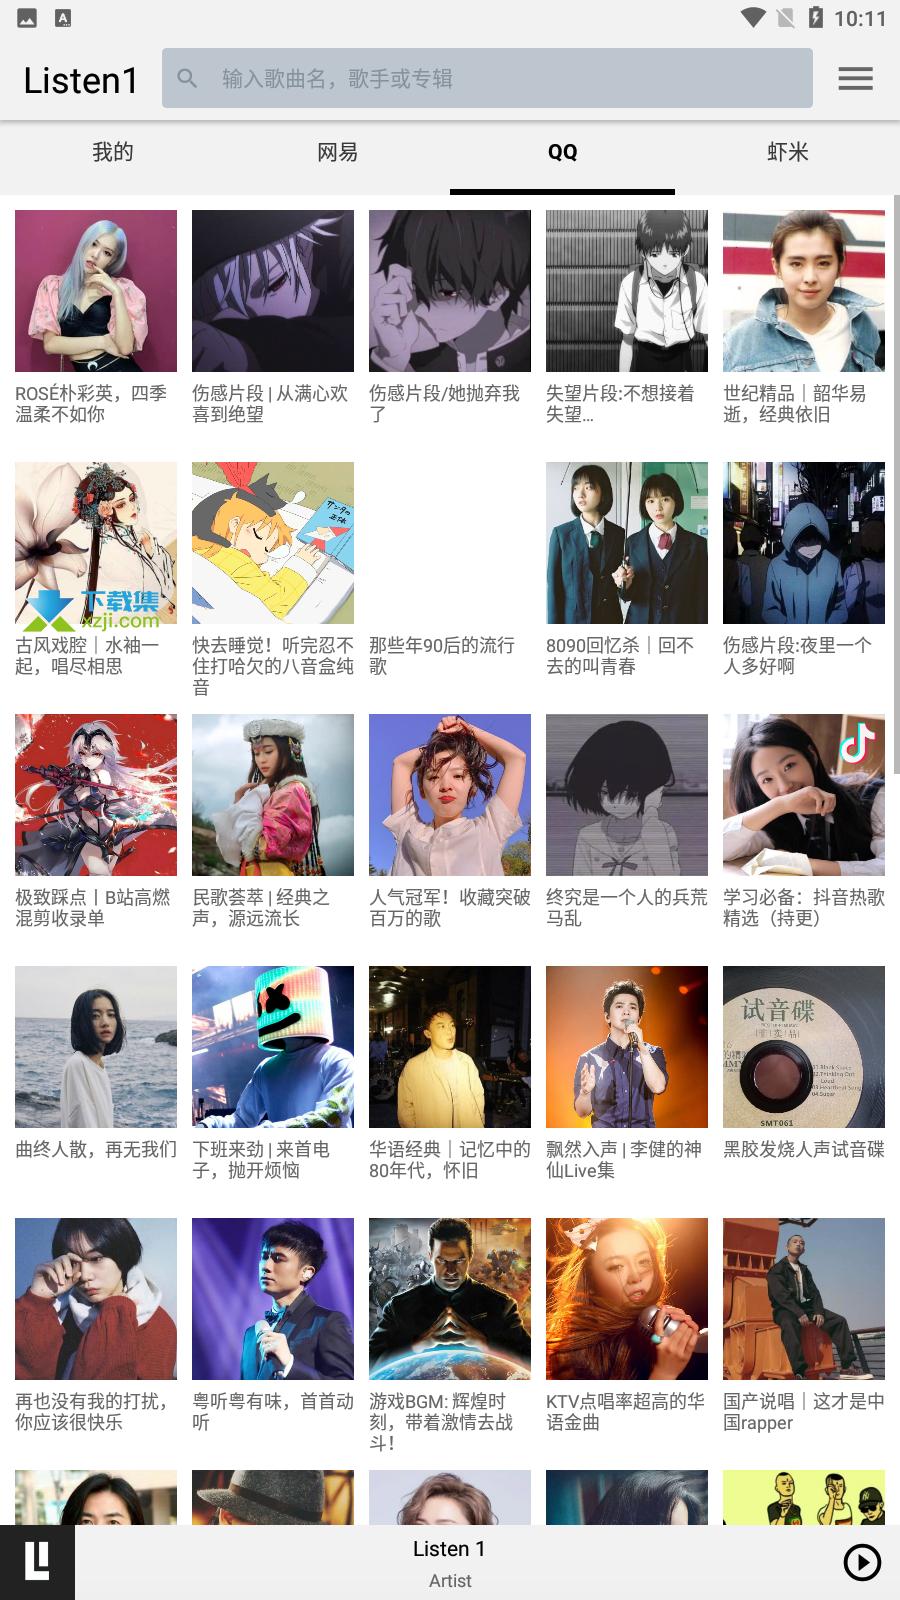 listen1安卓版界面1